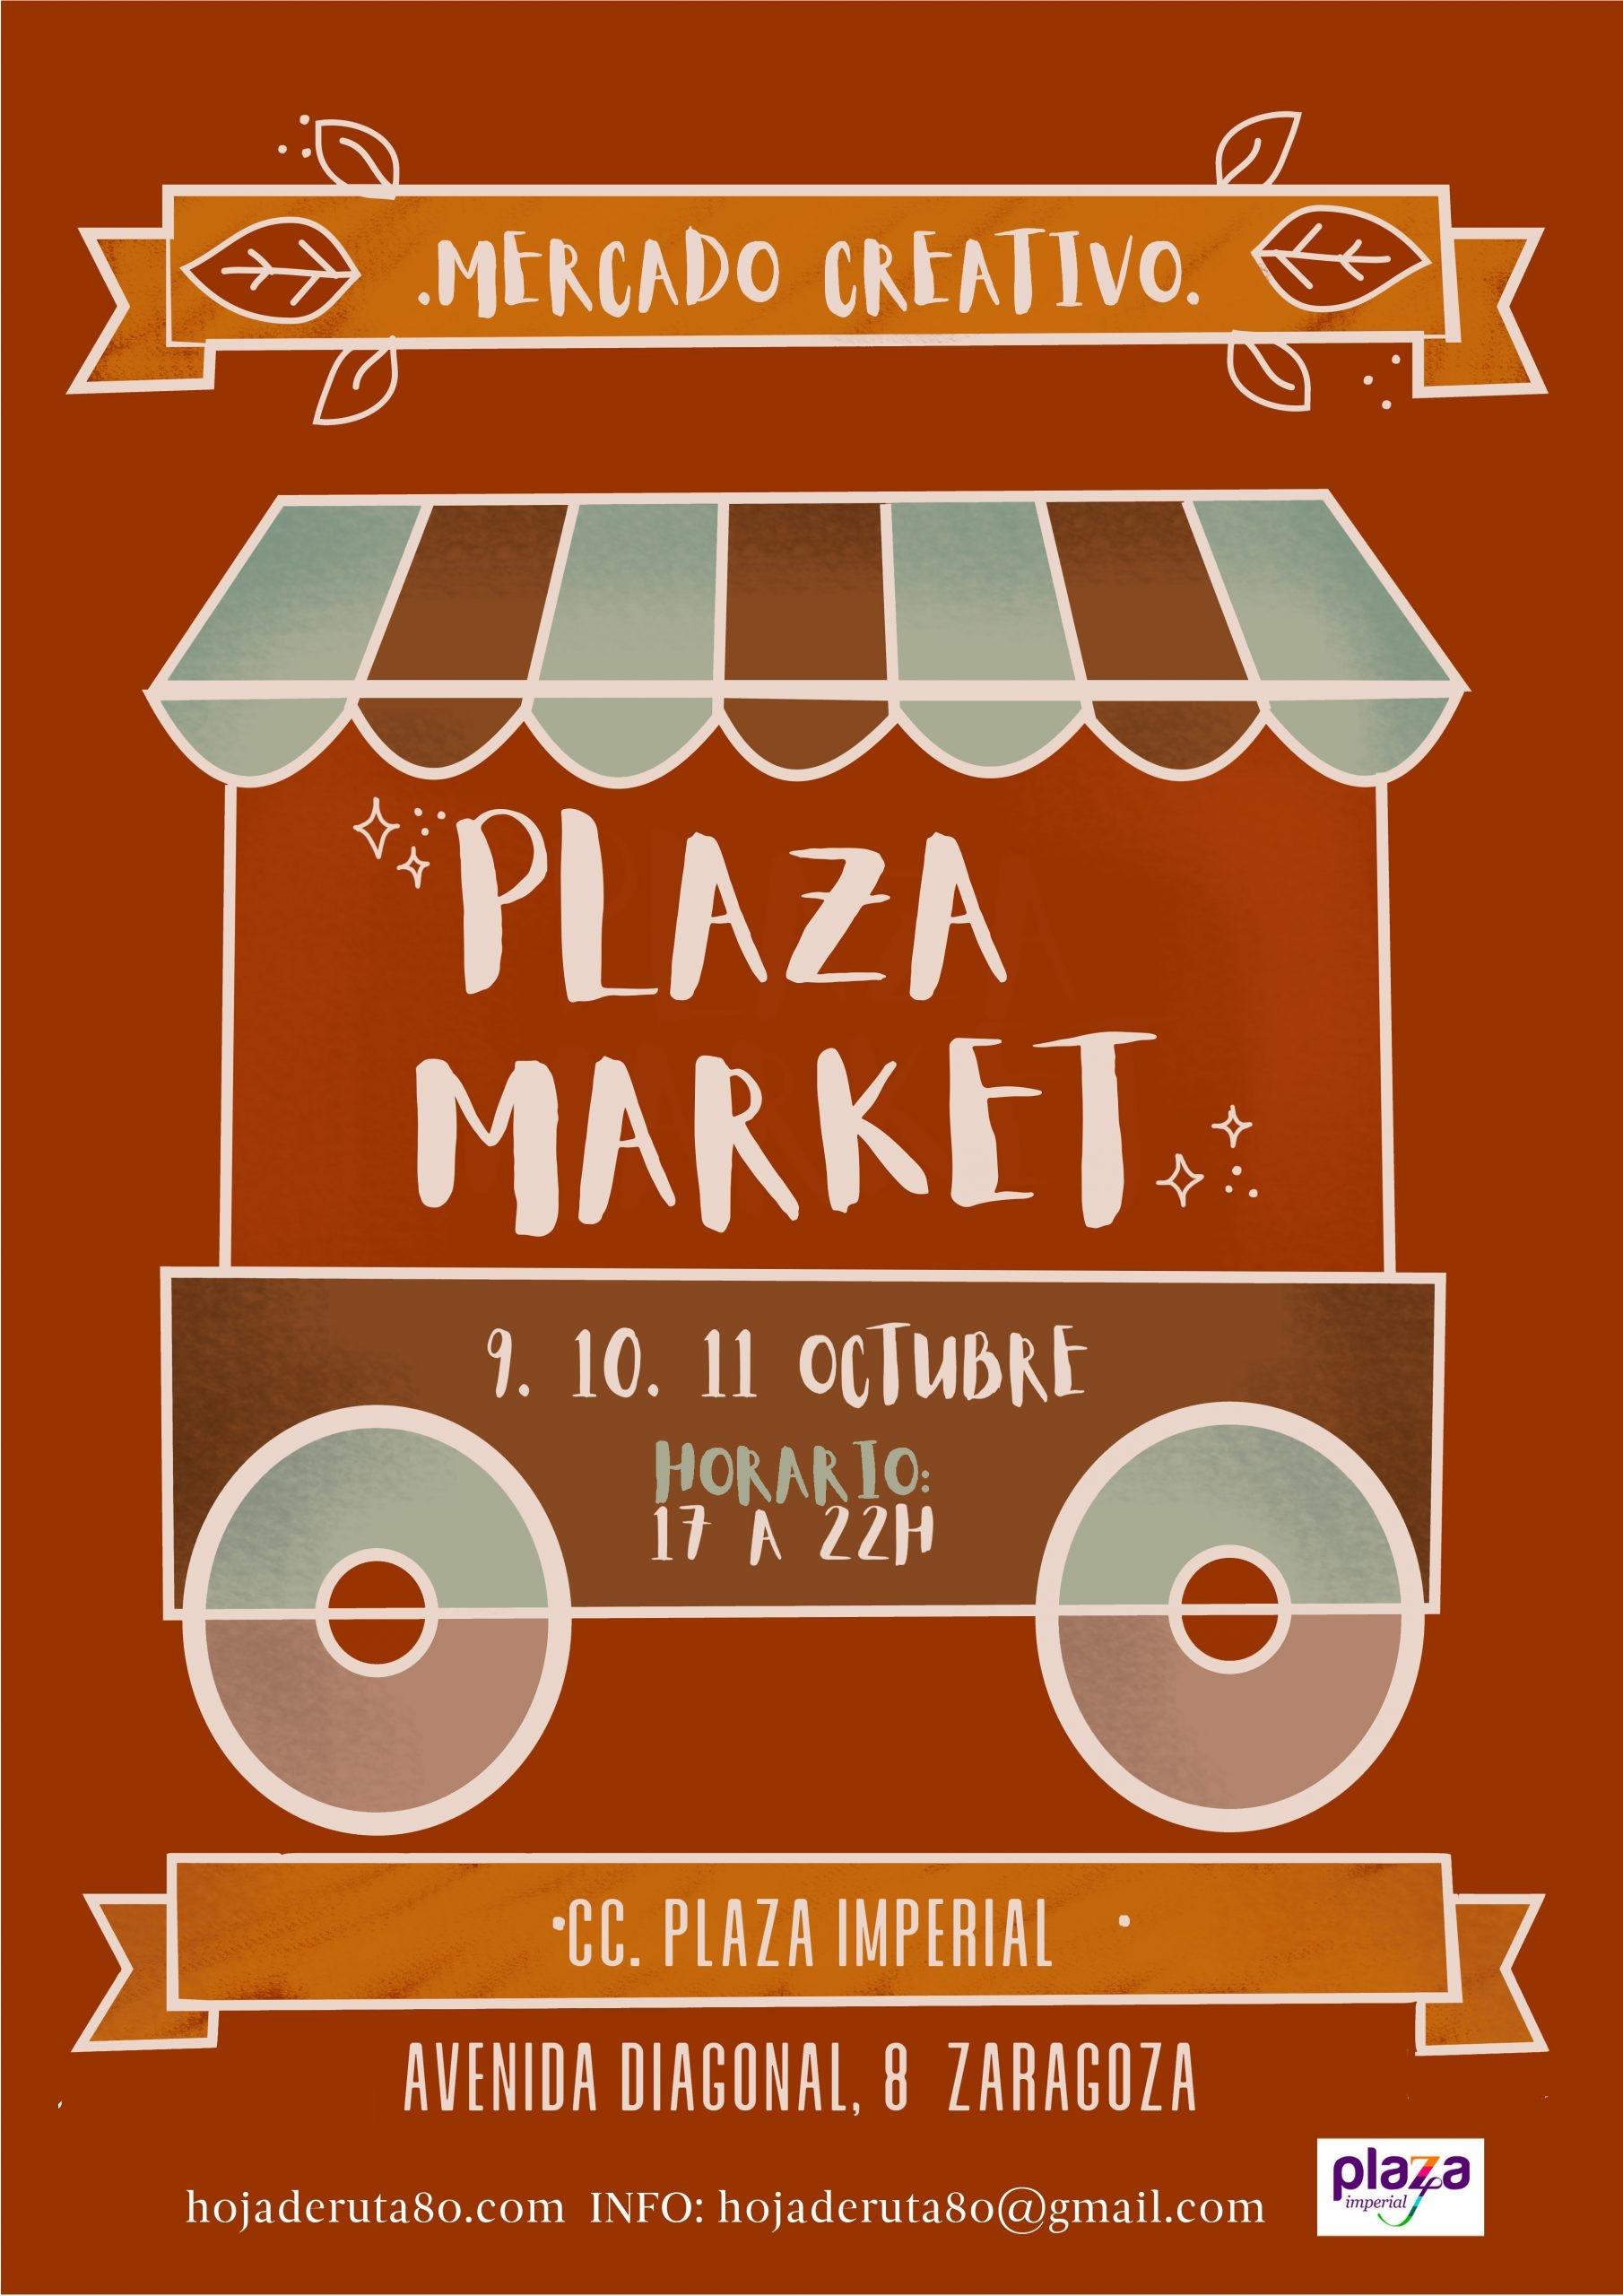 plaza market corregido